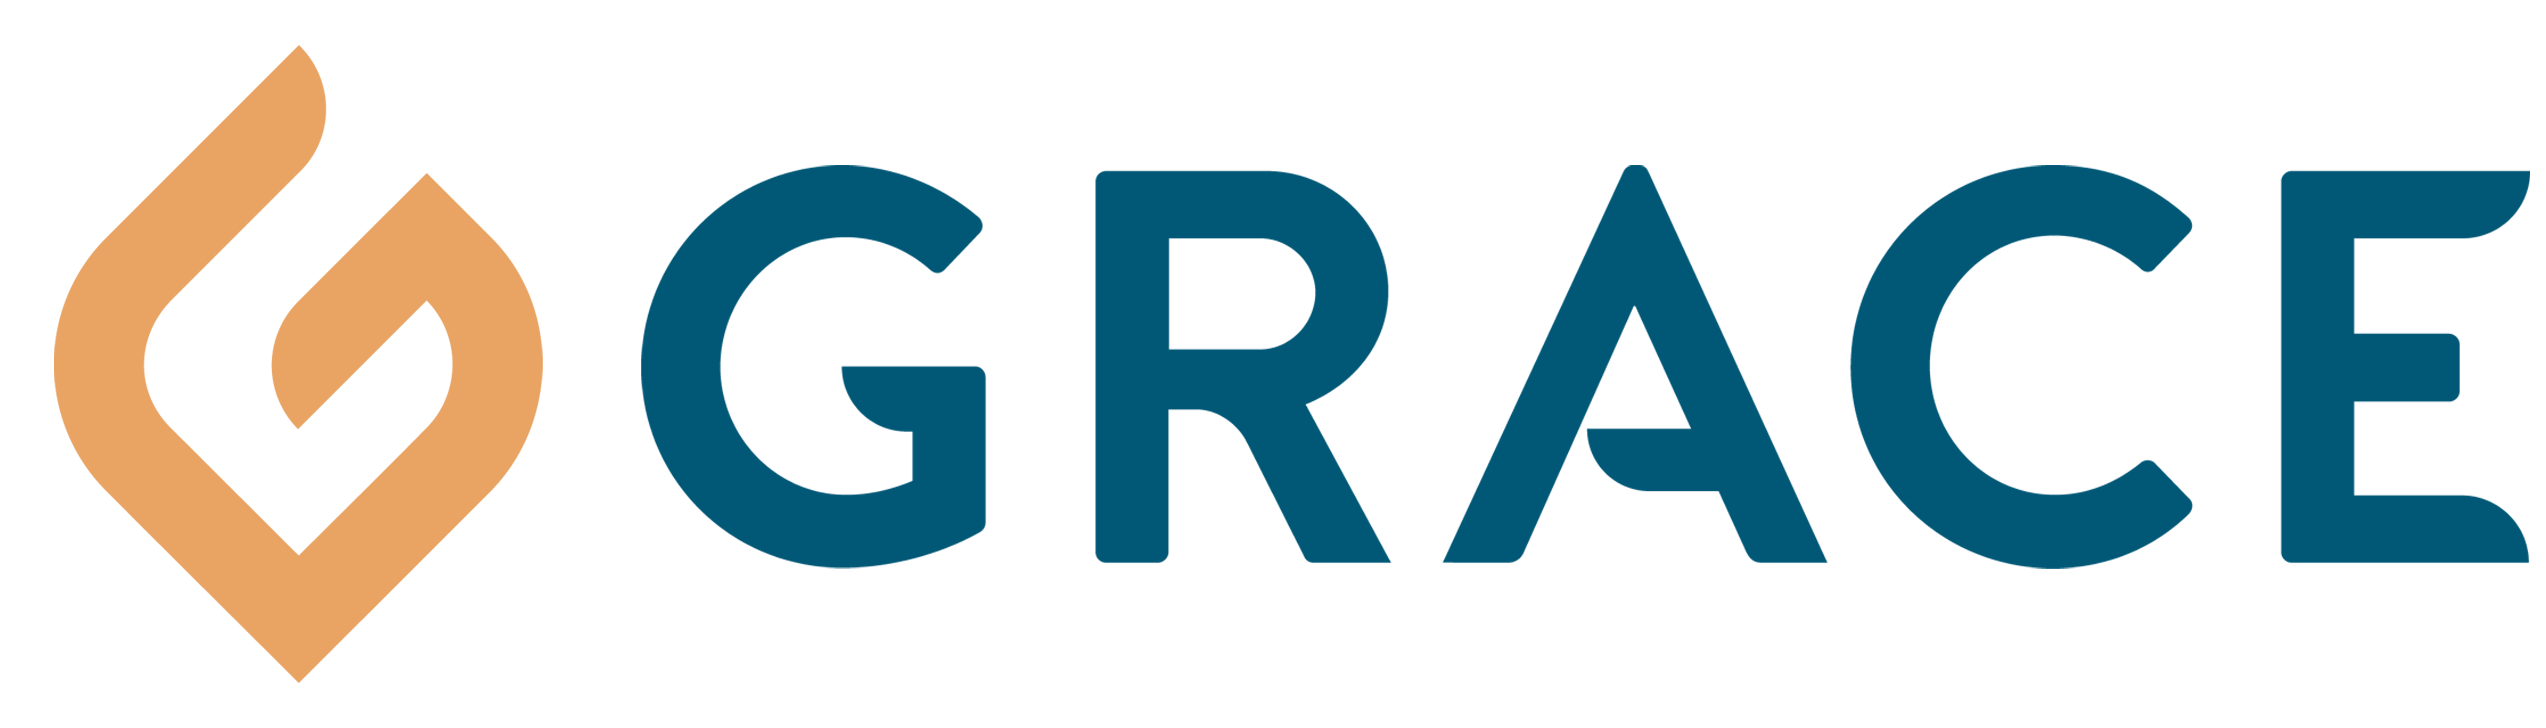 gracechurch-logo-full-color-scroll menu